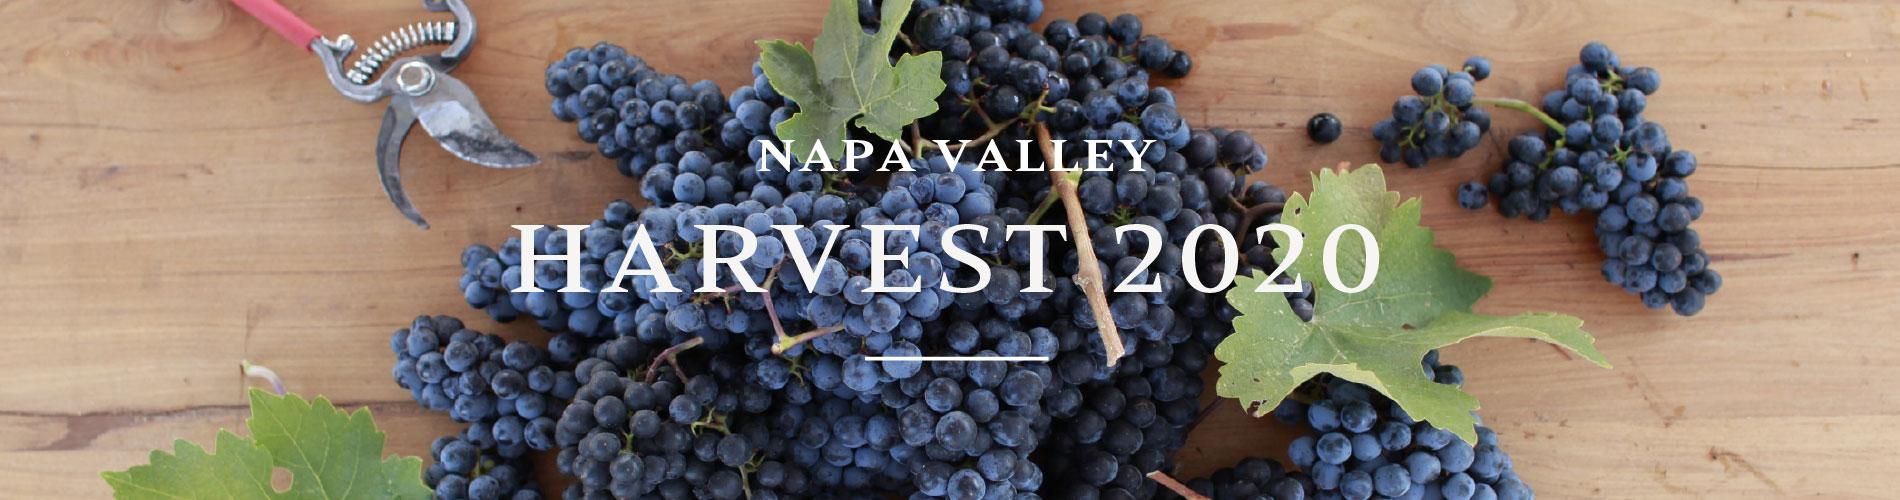 Napa Valley Harvest 2020